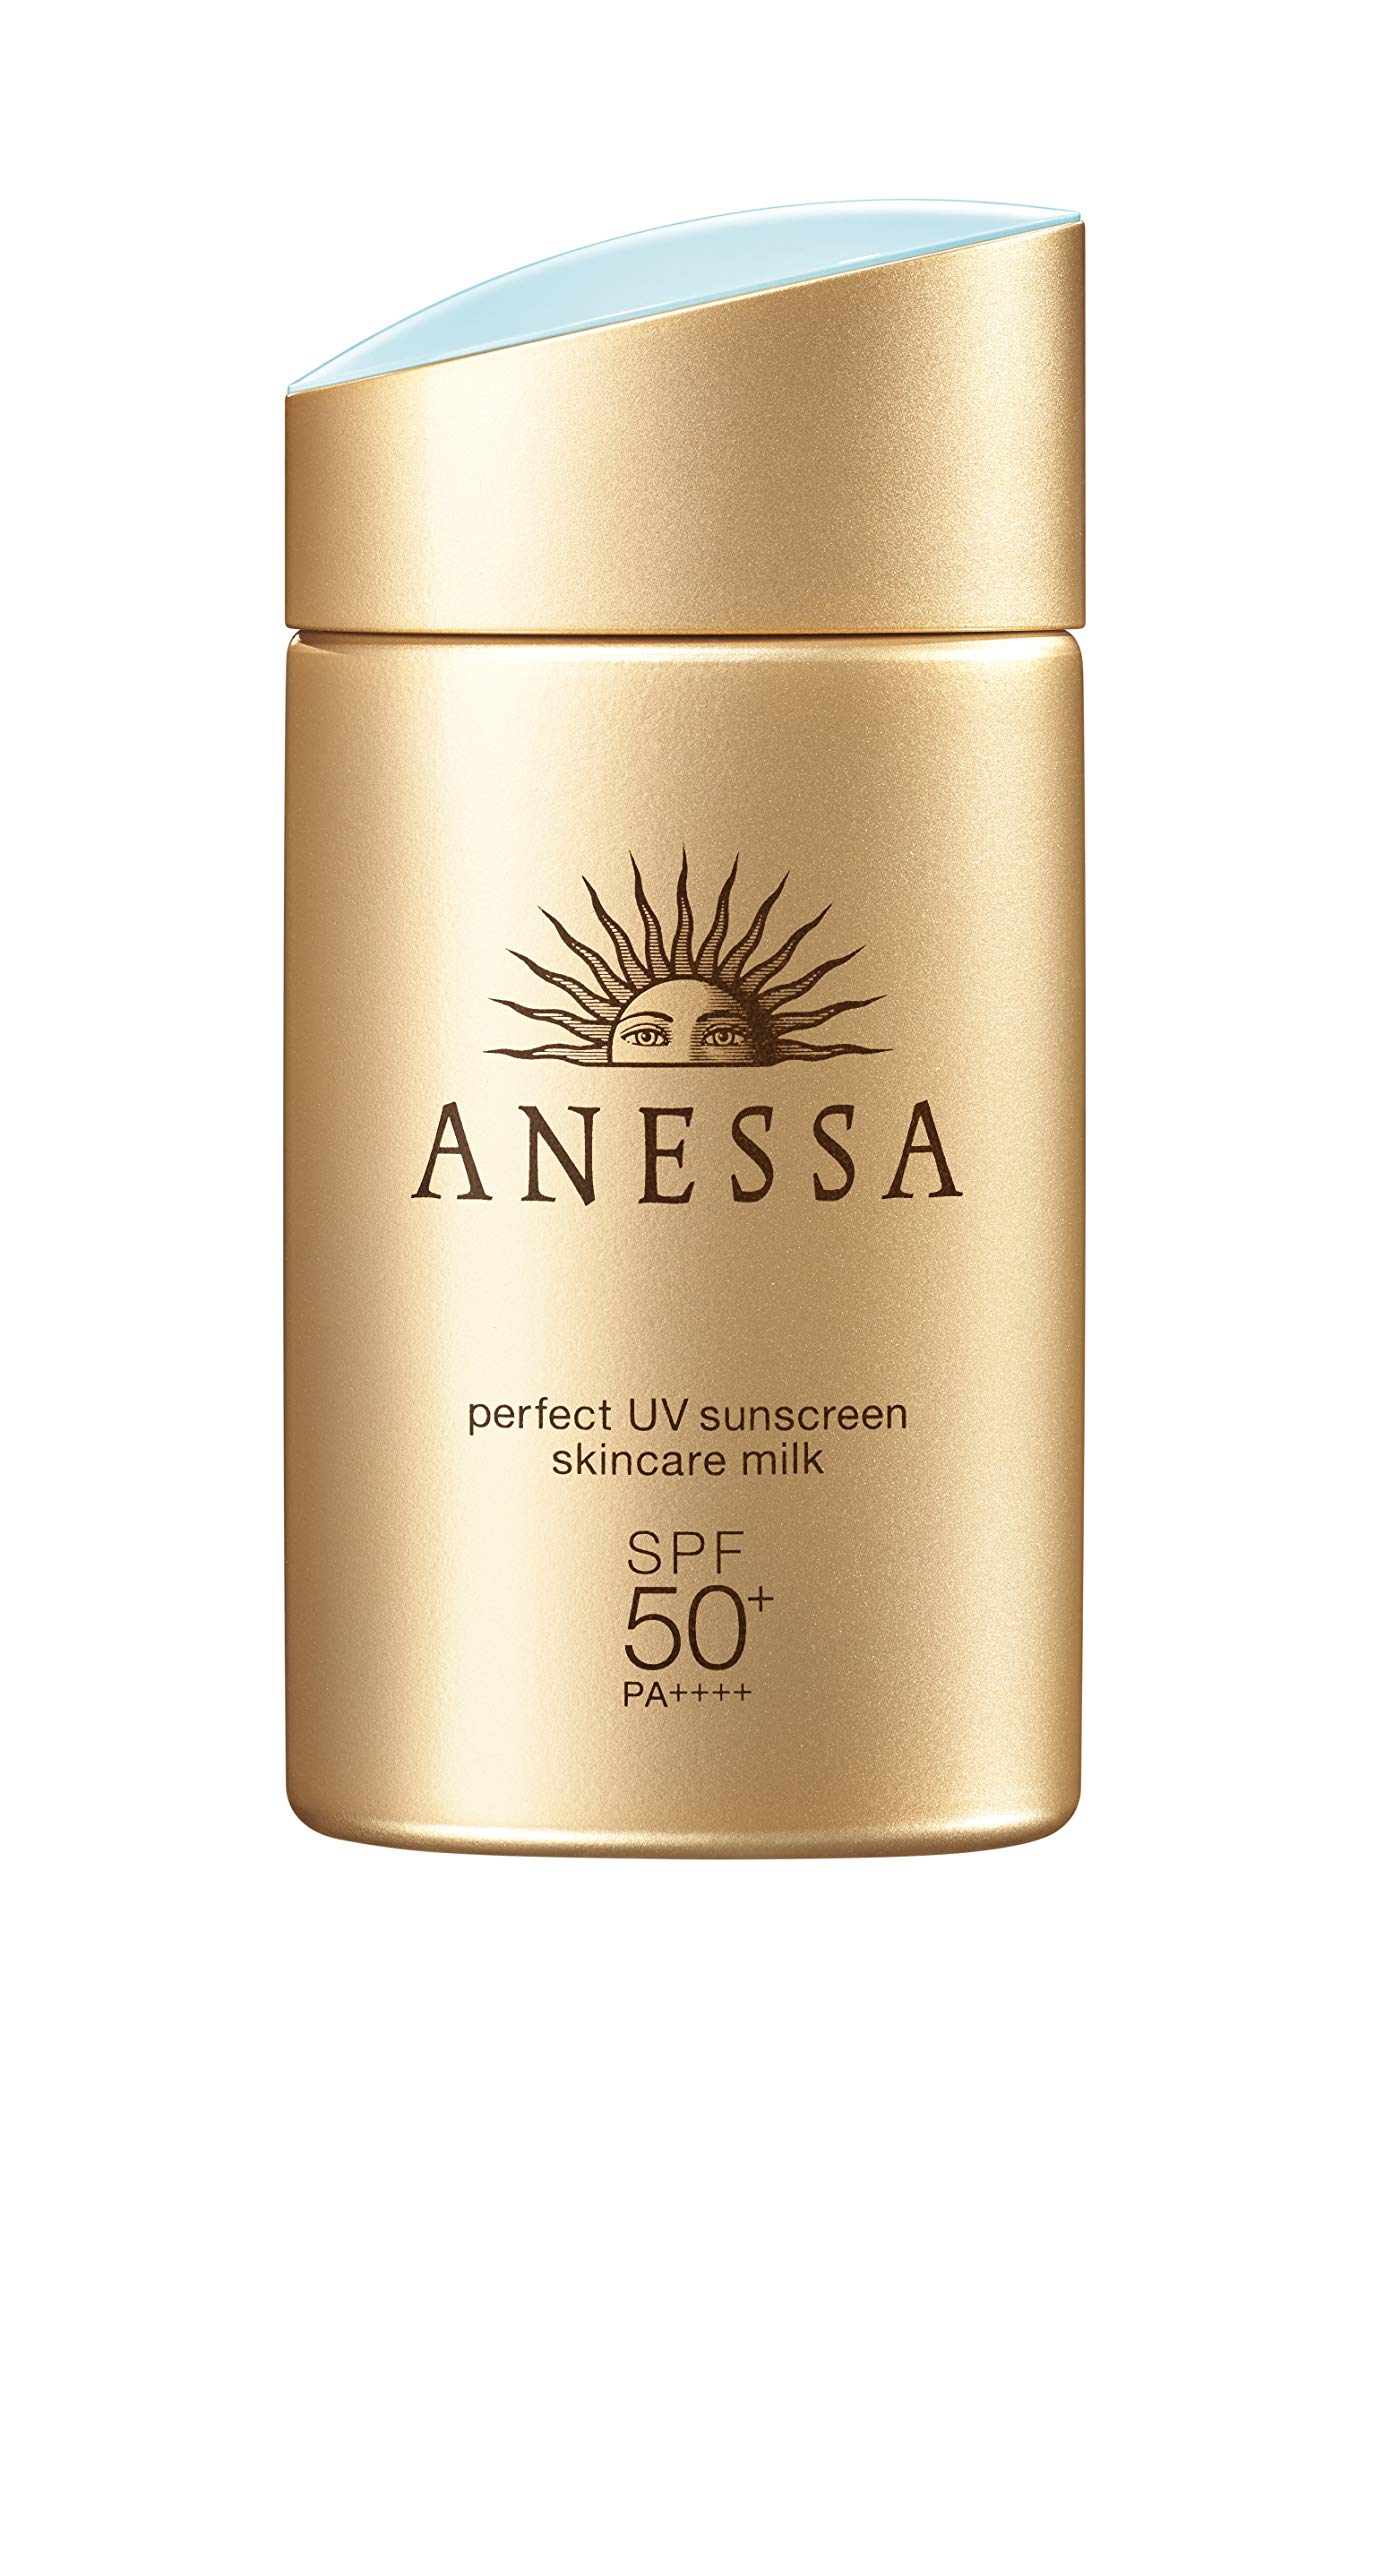 shiseido anessa perfect uv sunscreen skincare milk SPF50+/PA++++ 60mL/2oz by Anessa